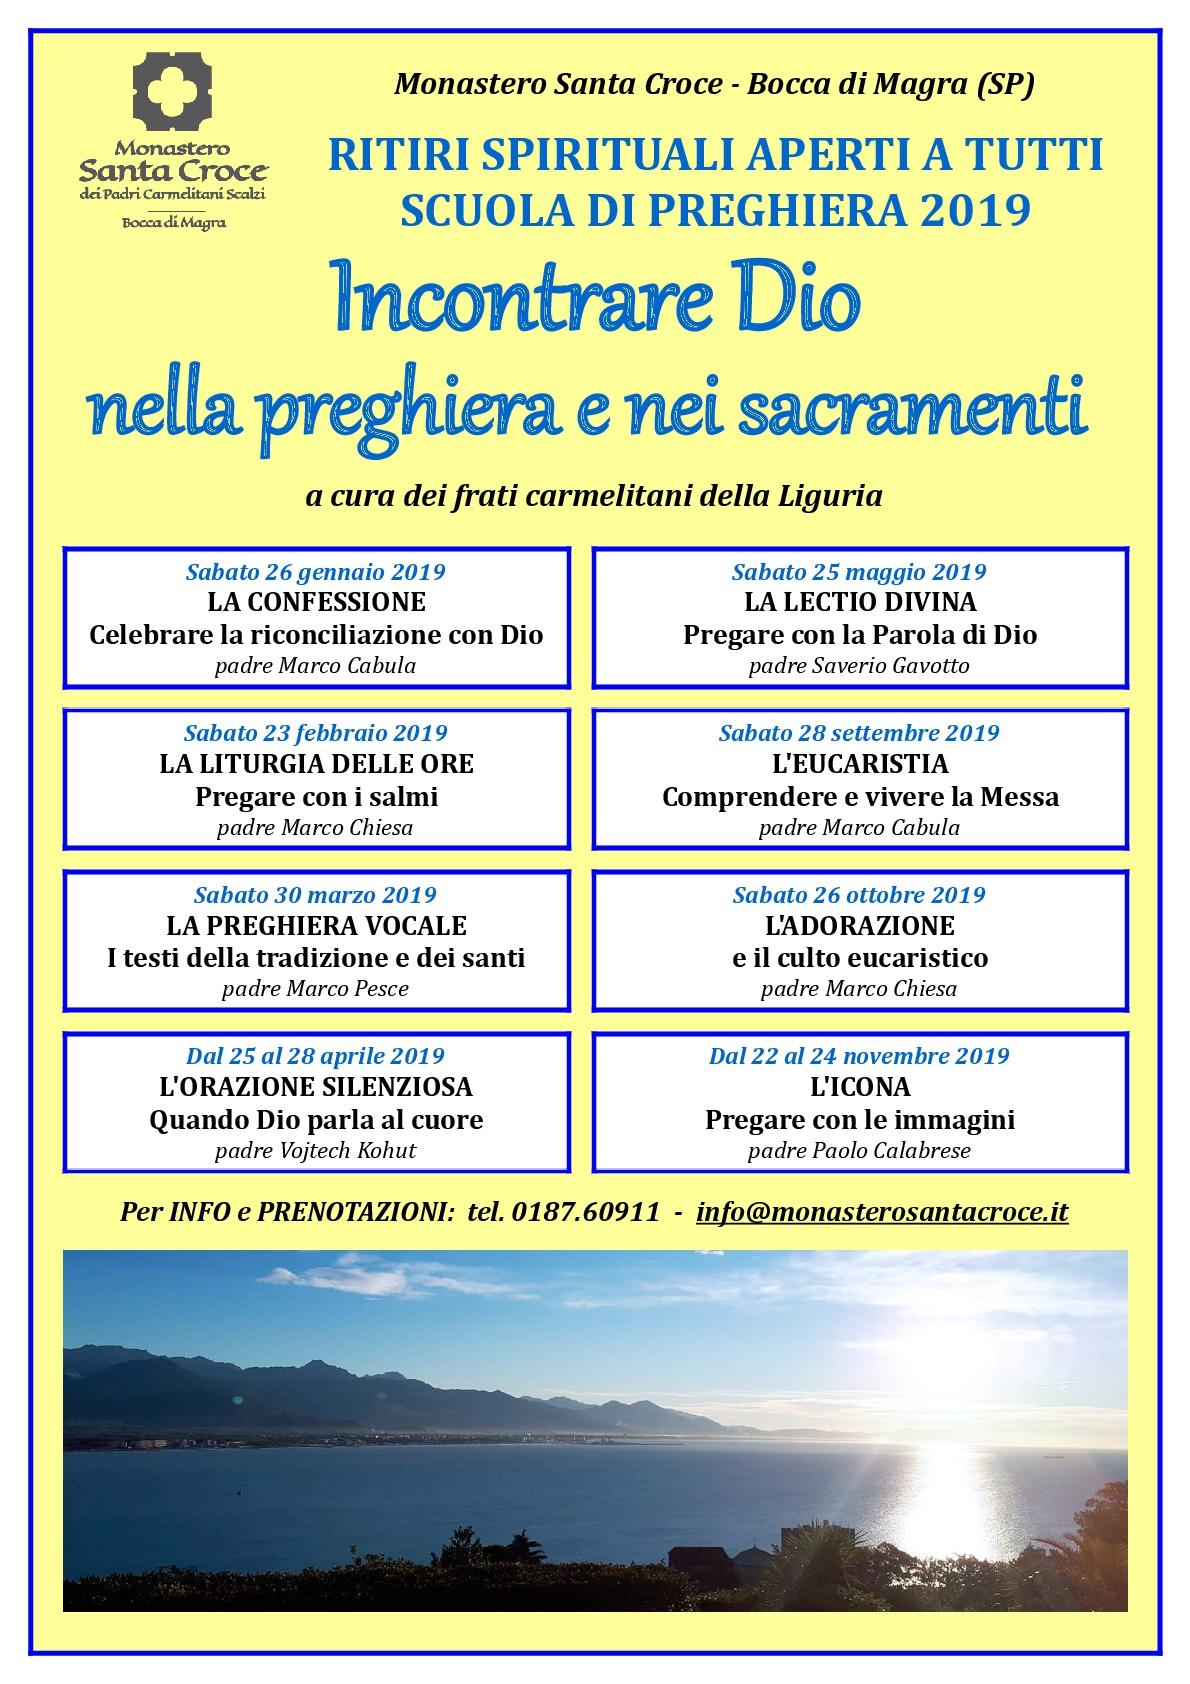 Parole Di Vita Calendario 2019.Calendario Monastero Santa Croce